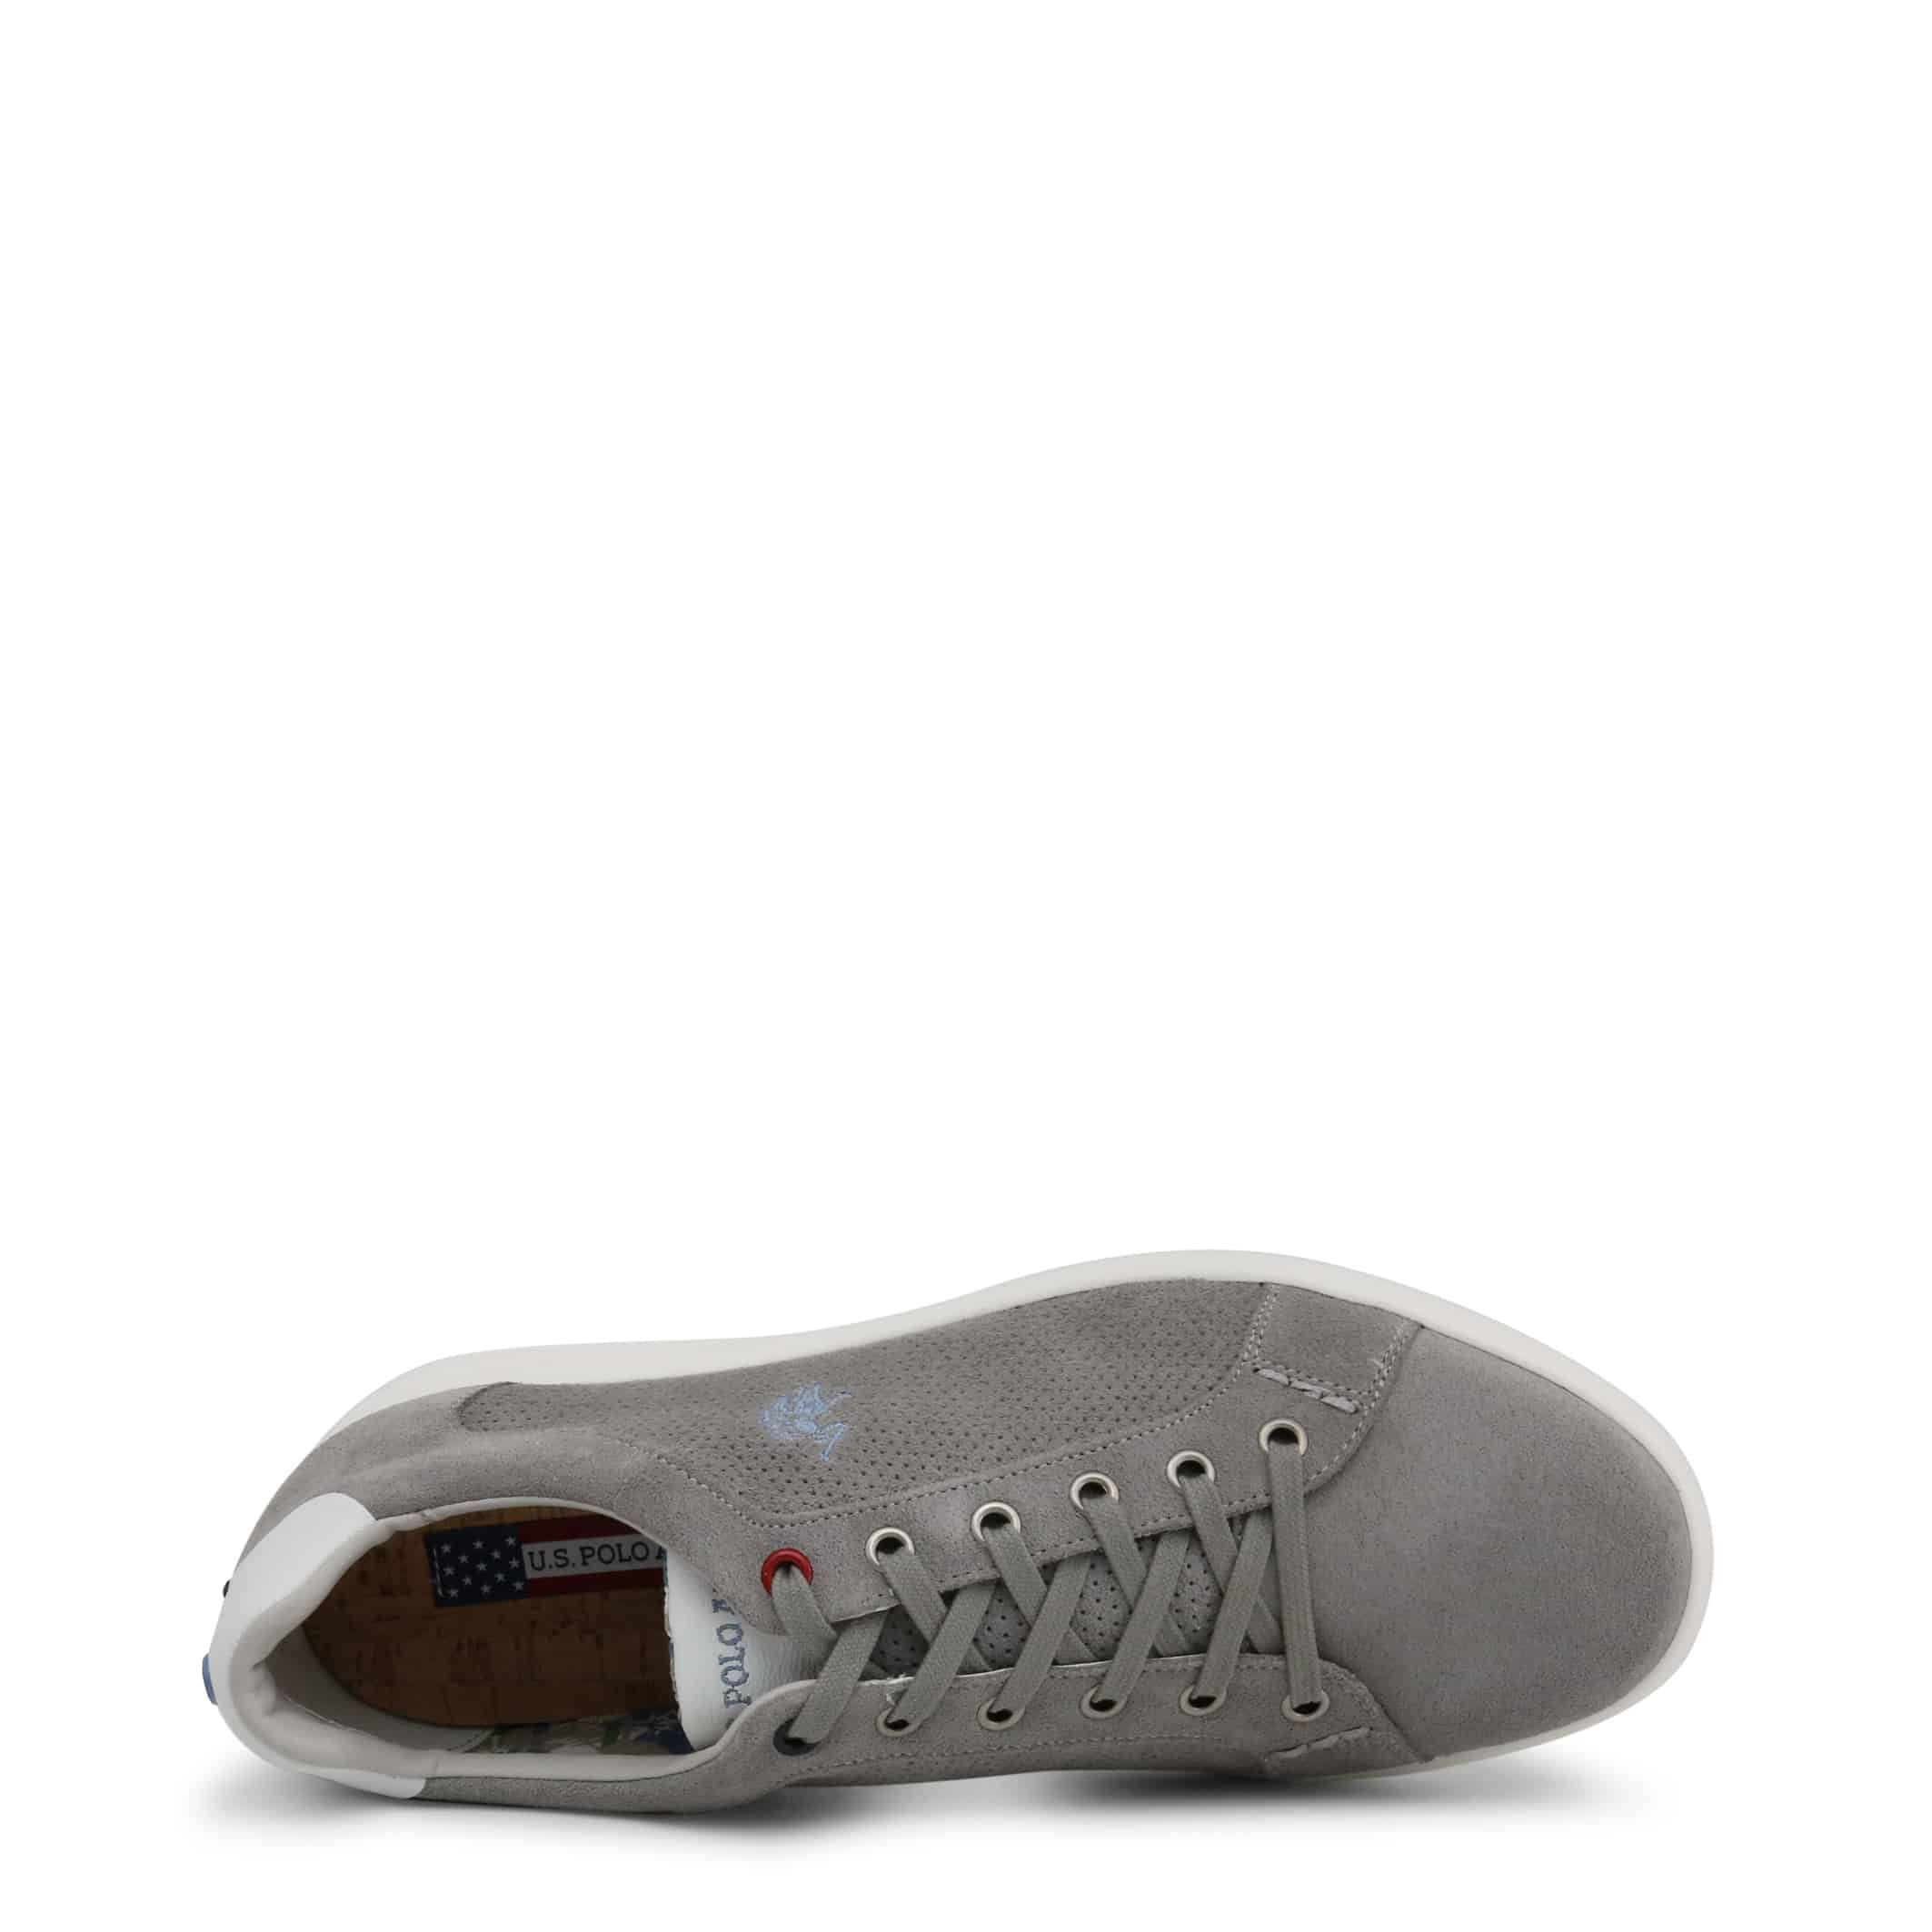 Sneakers U.S. Polo Assn. – FALKS4170S8_S1